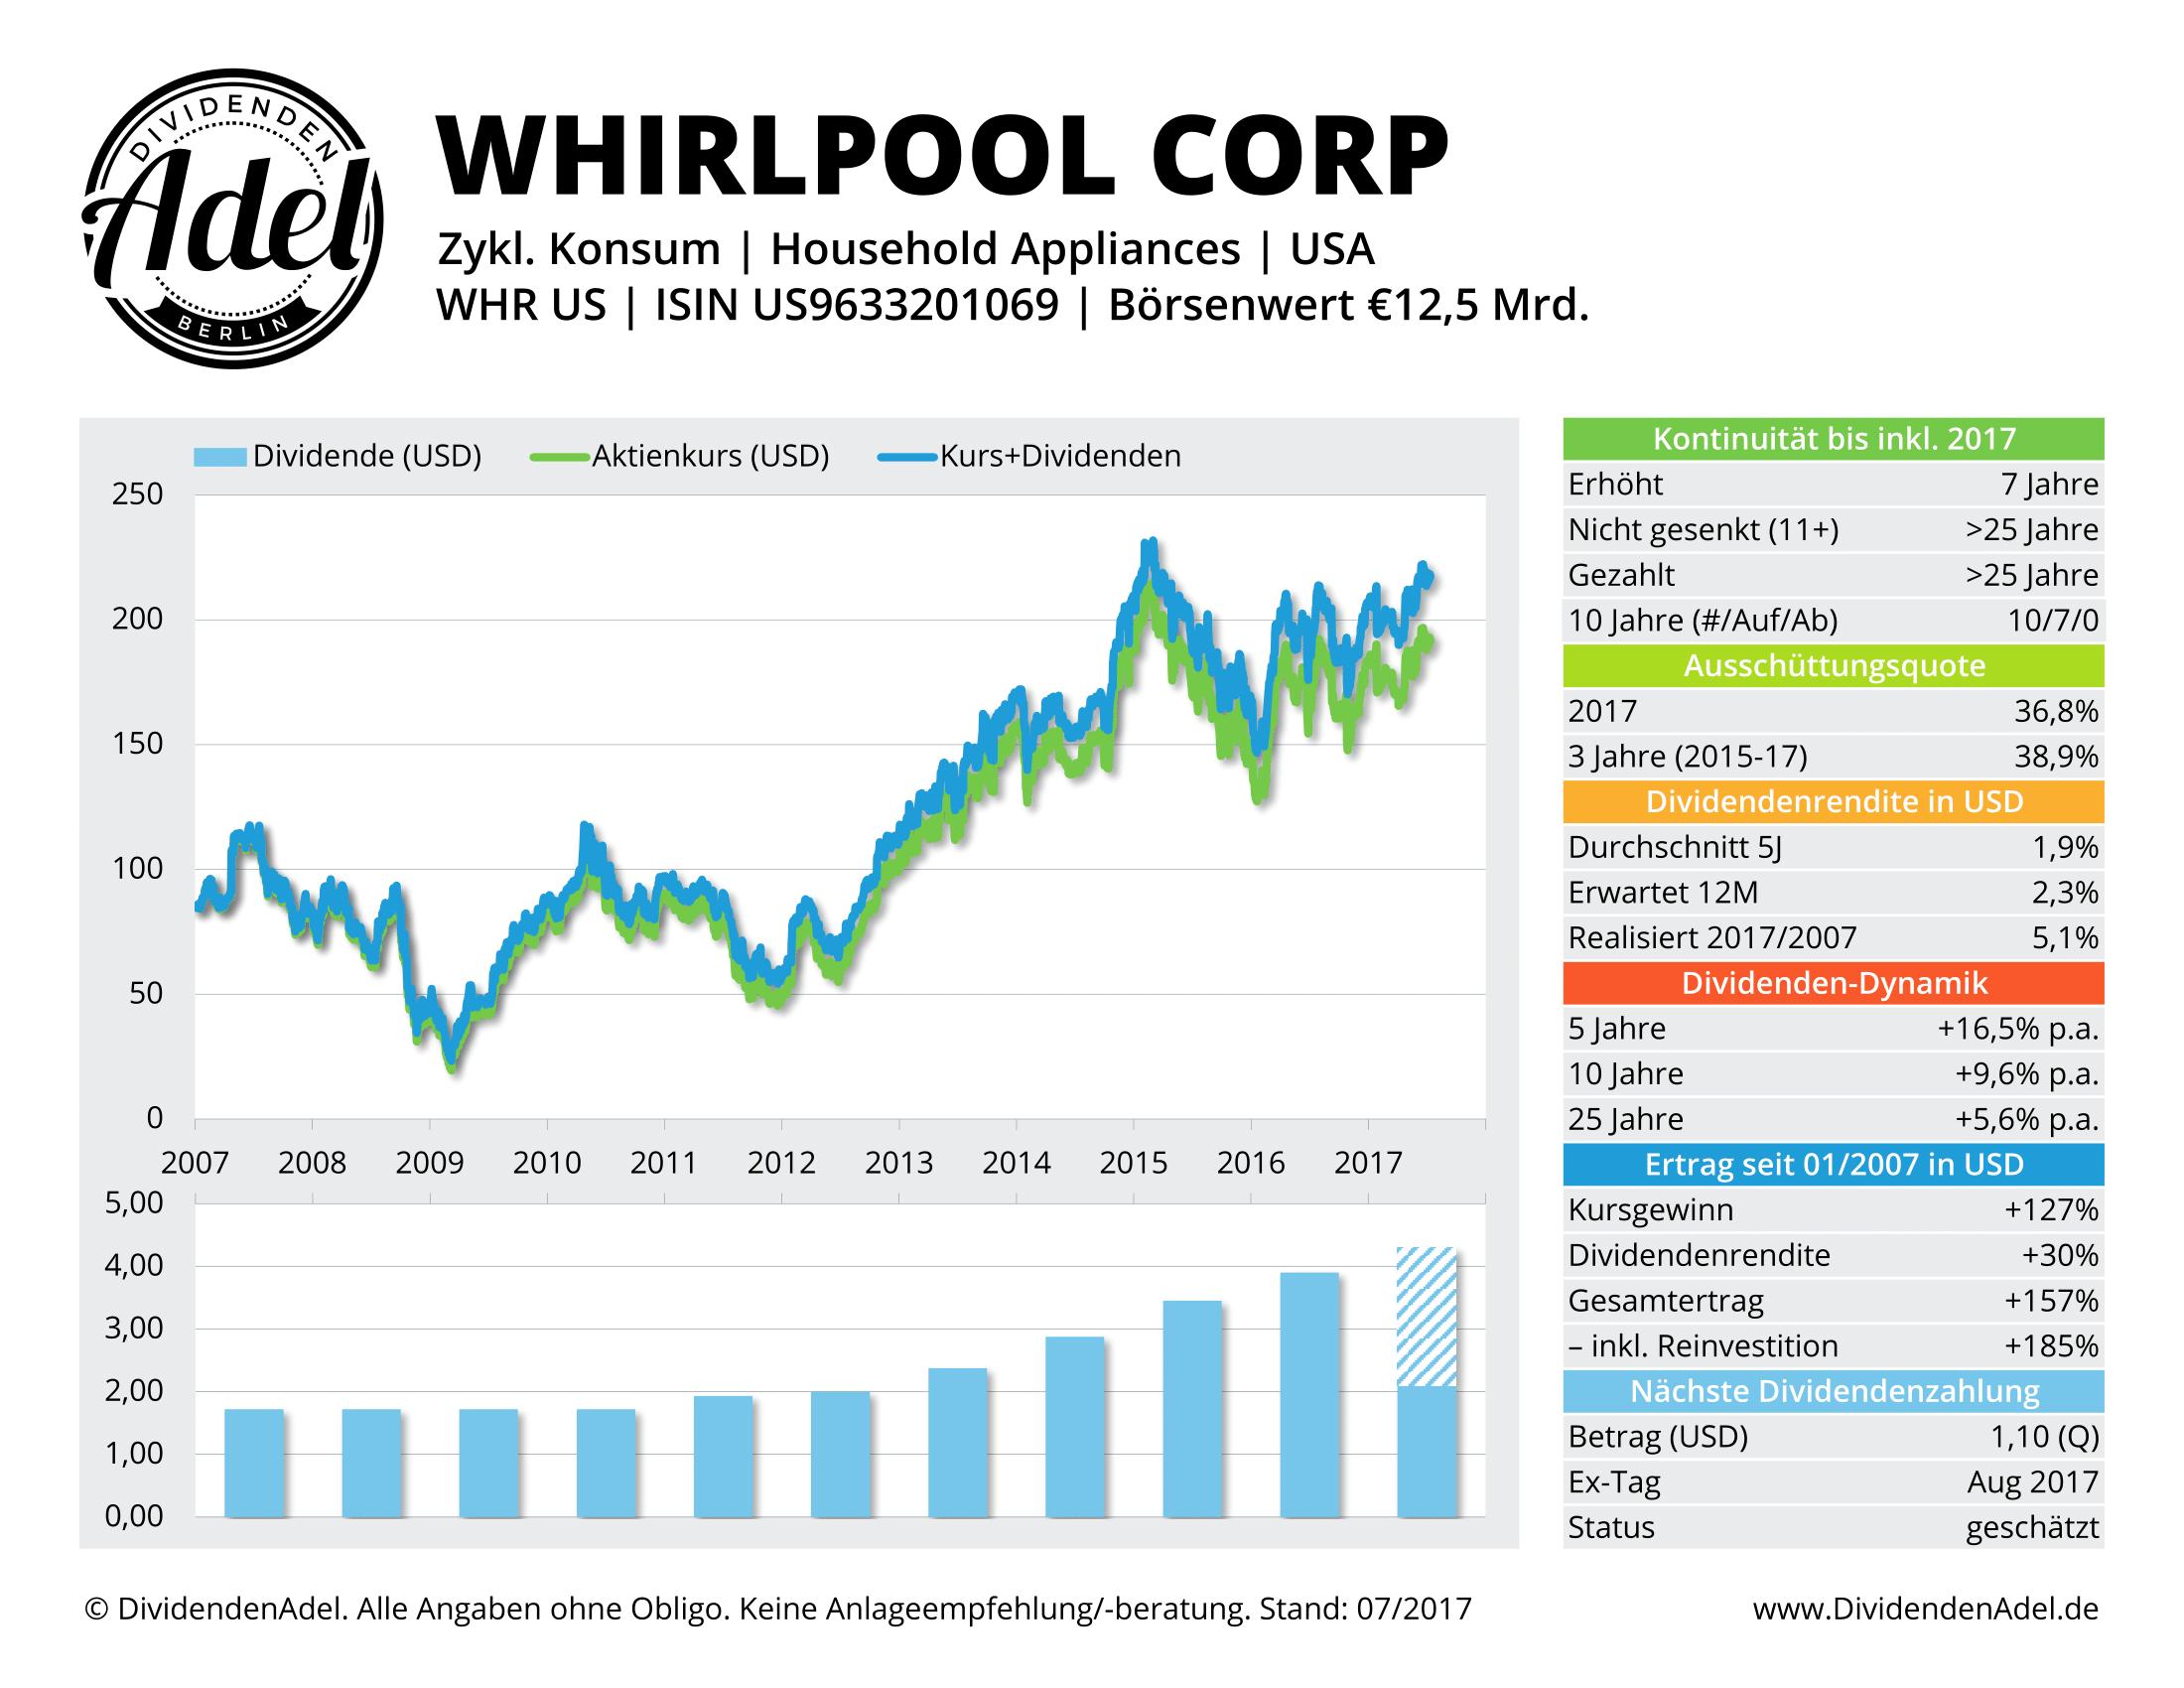 WHIRLPOOL CORP DividendenAdel-Profil